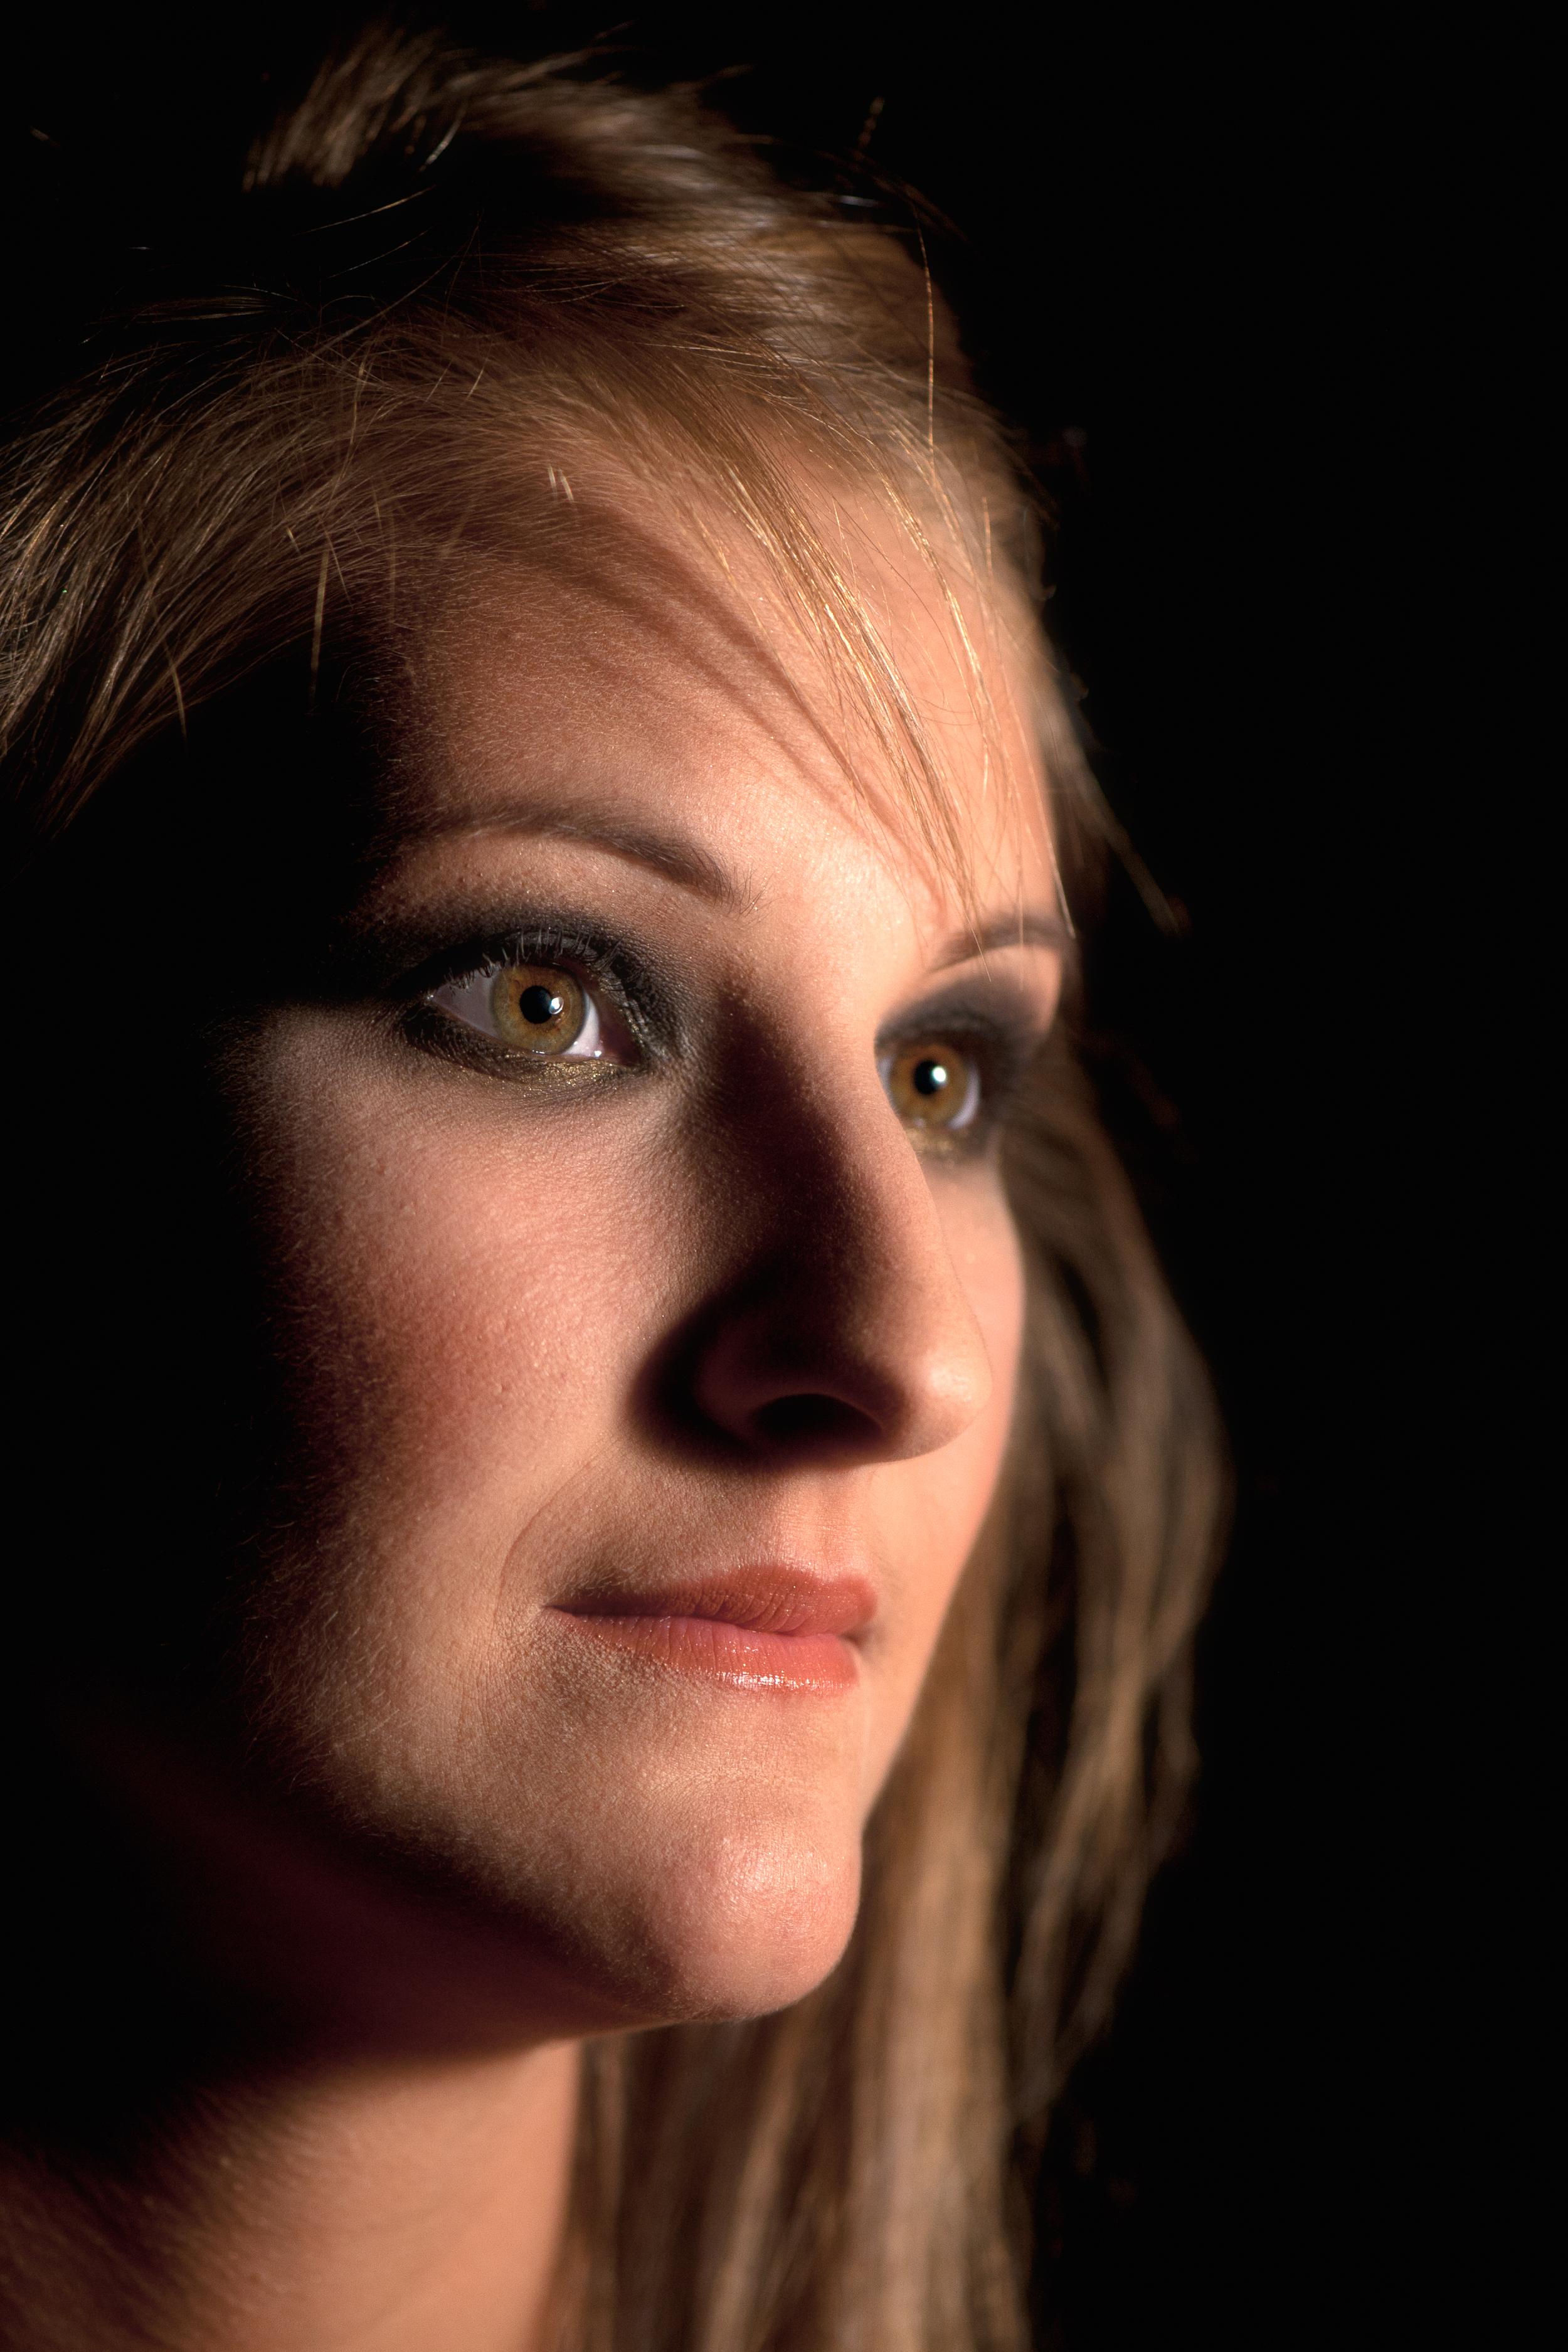 Portret_Studio_Open_Deur_Dagen_Syntra_20110905_0030-Edit-Edit.jpg